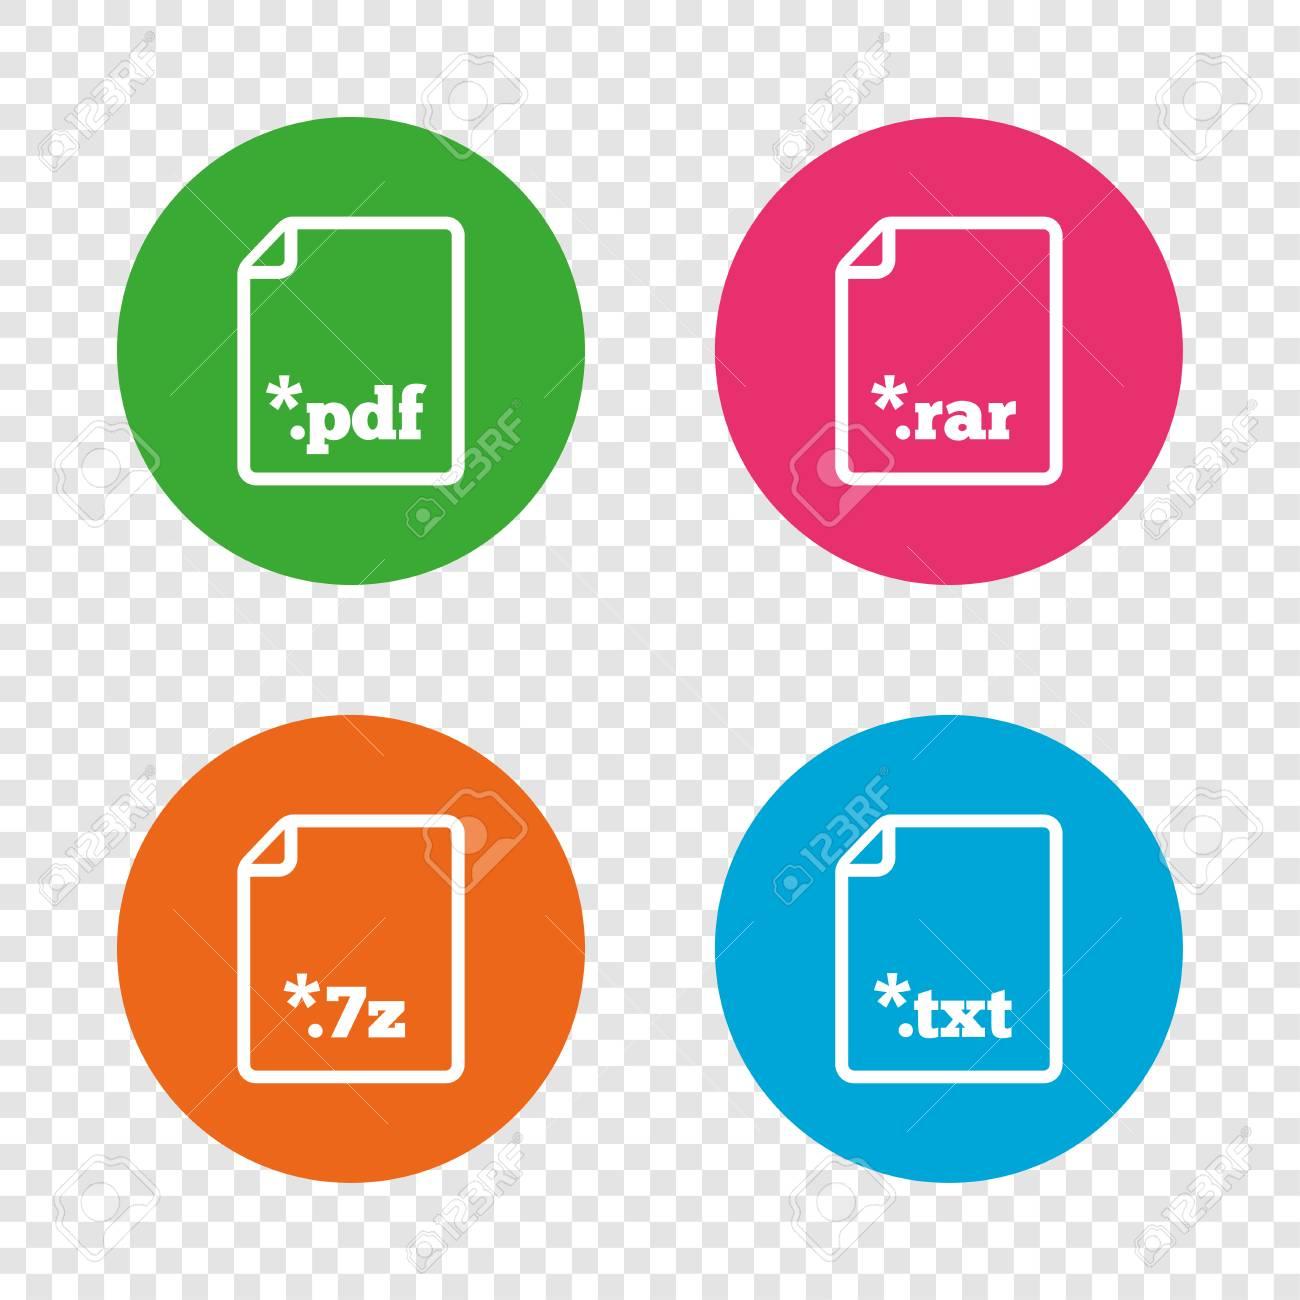 Download Document Icons File Extensions Symbols Pdf Rar 7z